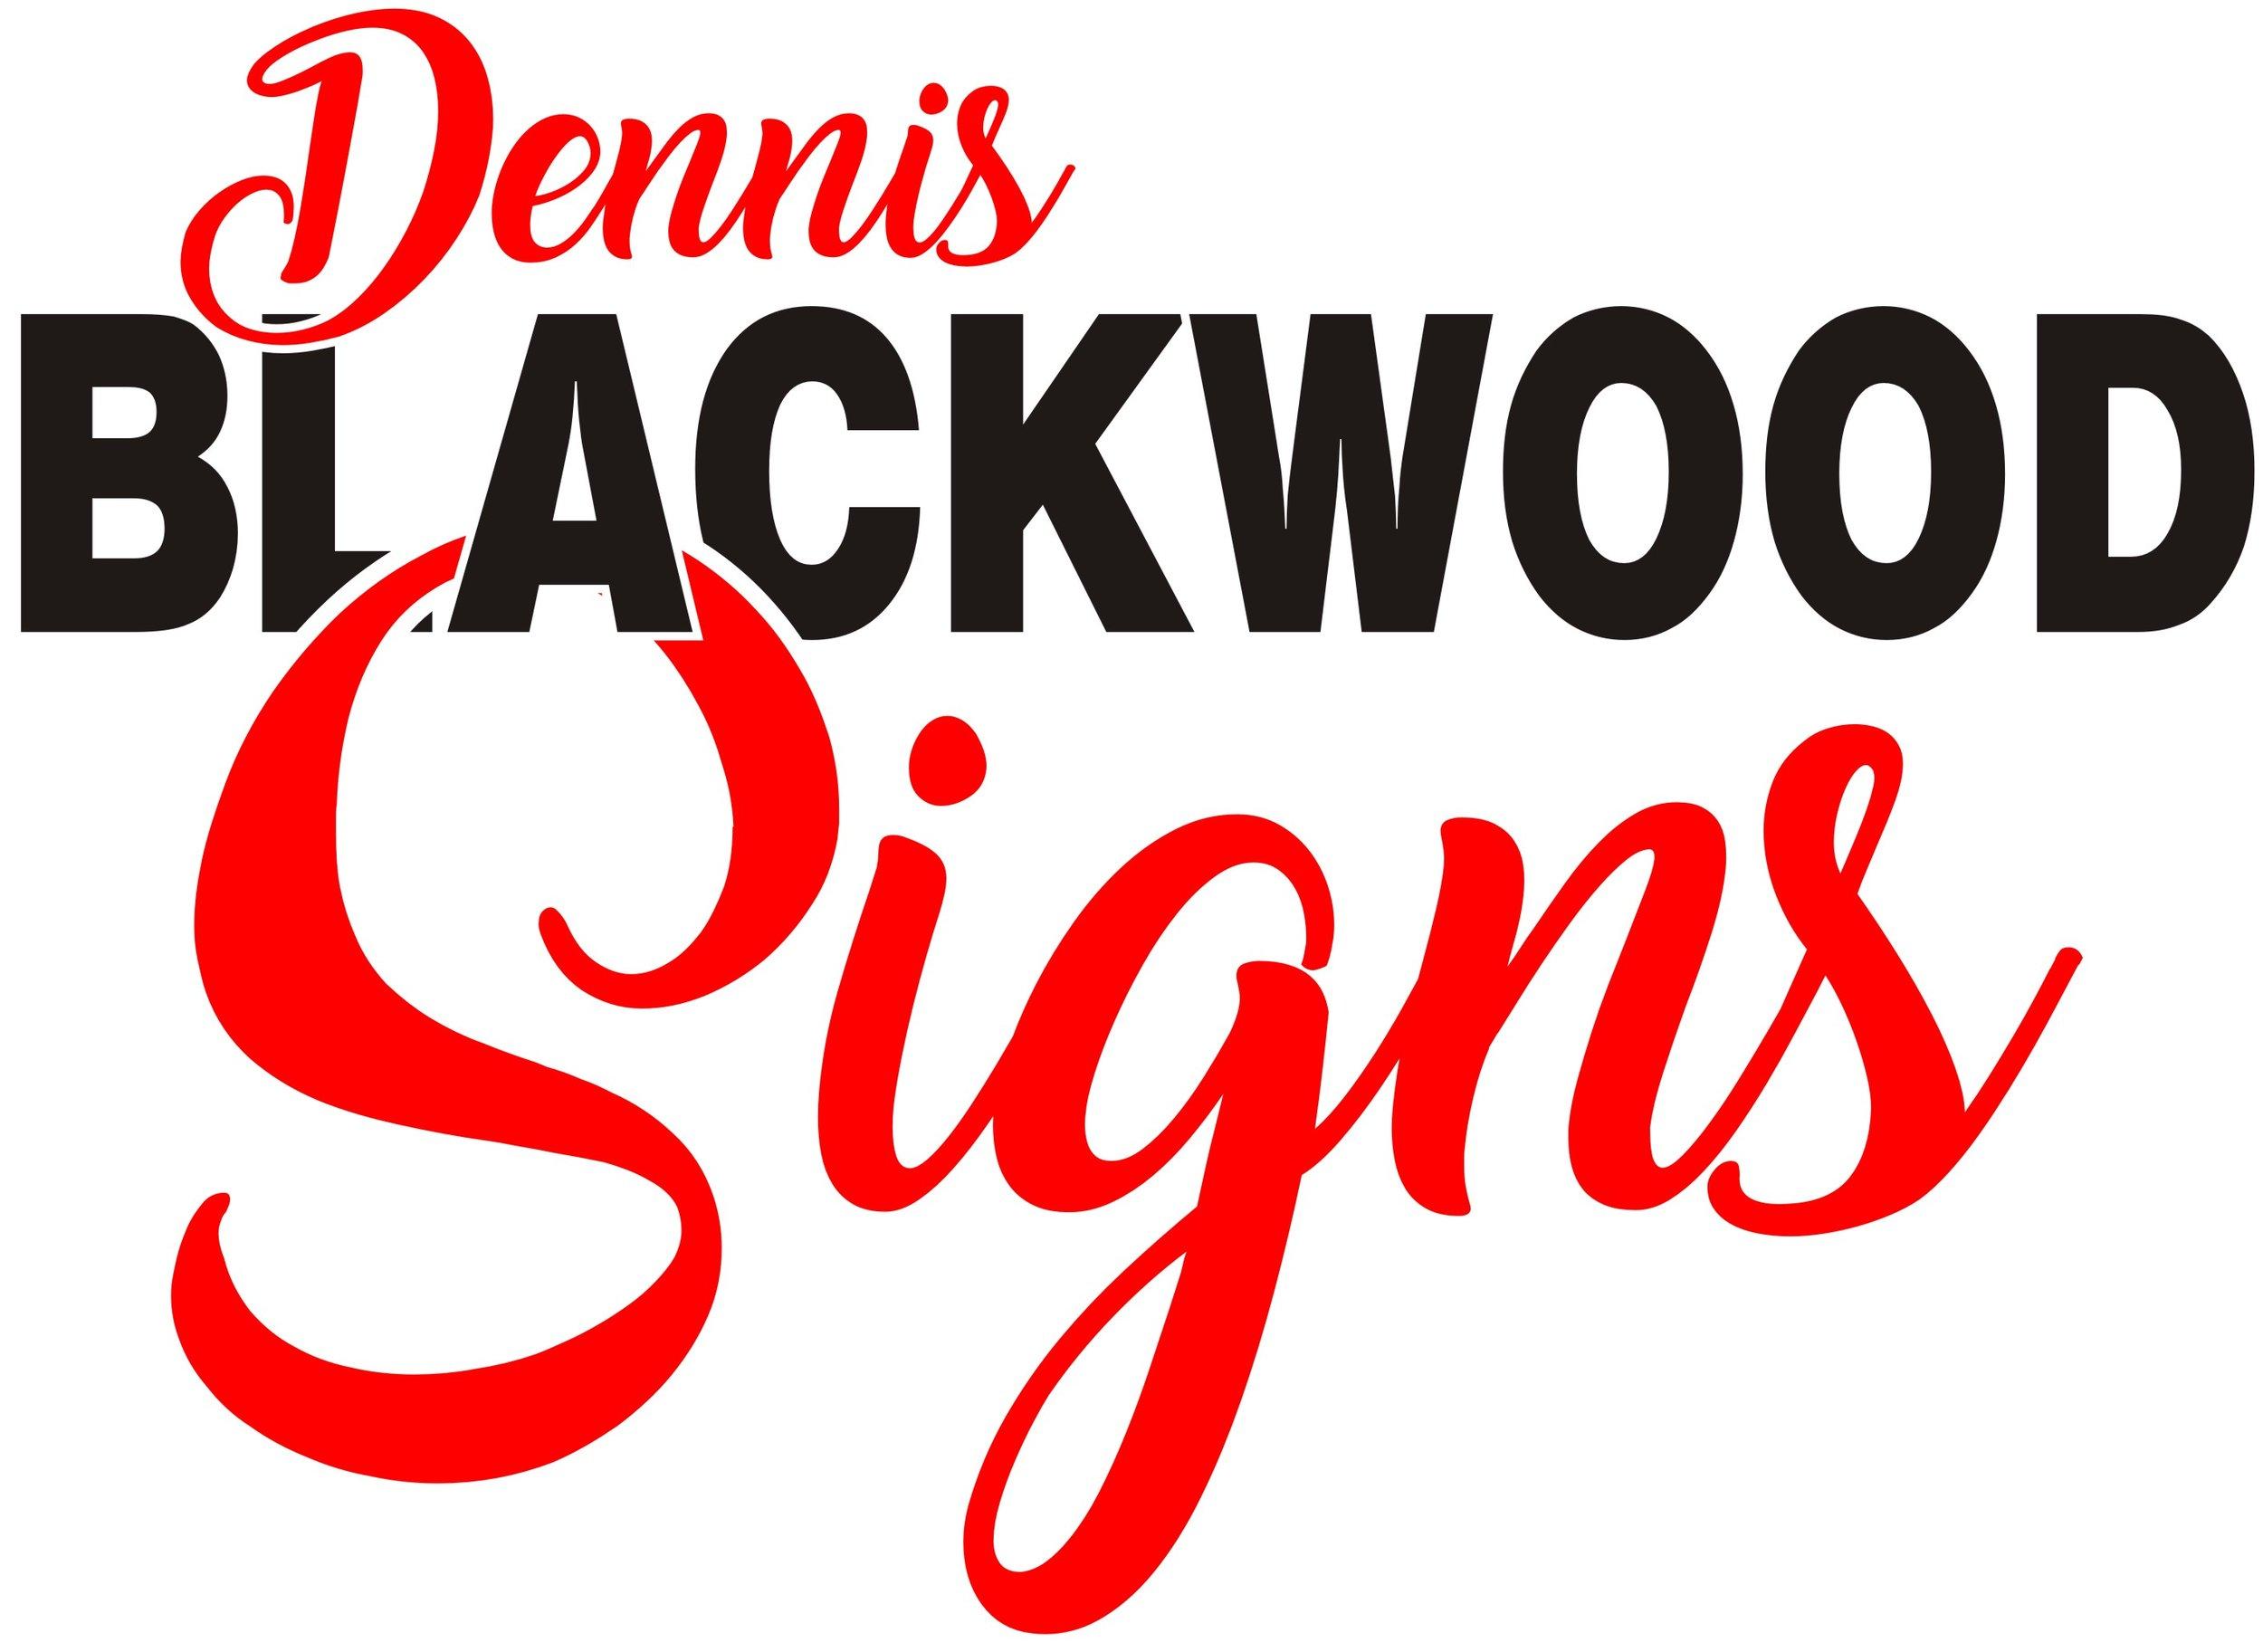 DENNIS BLACKWOOD new logo 2019.jpg